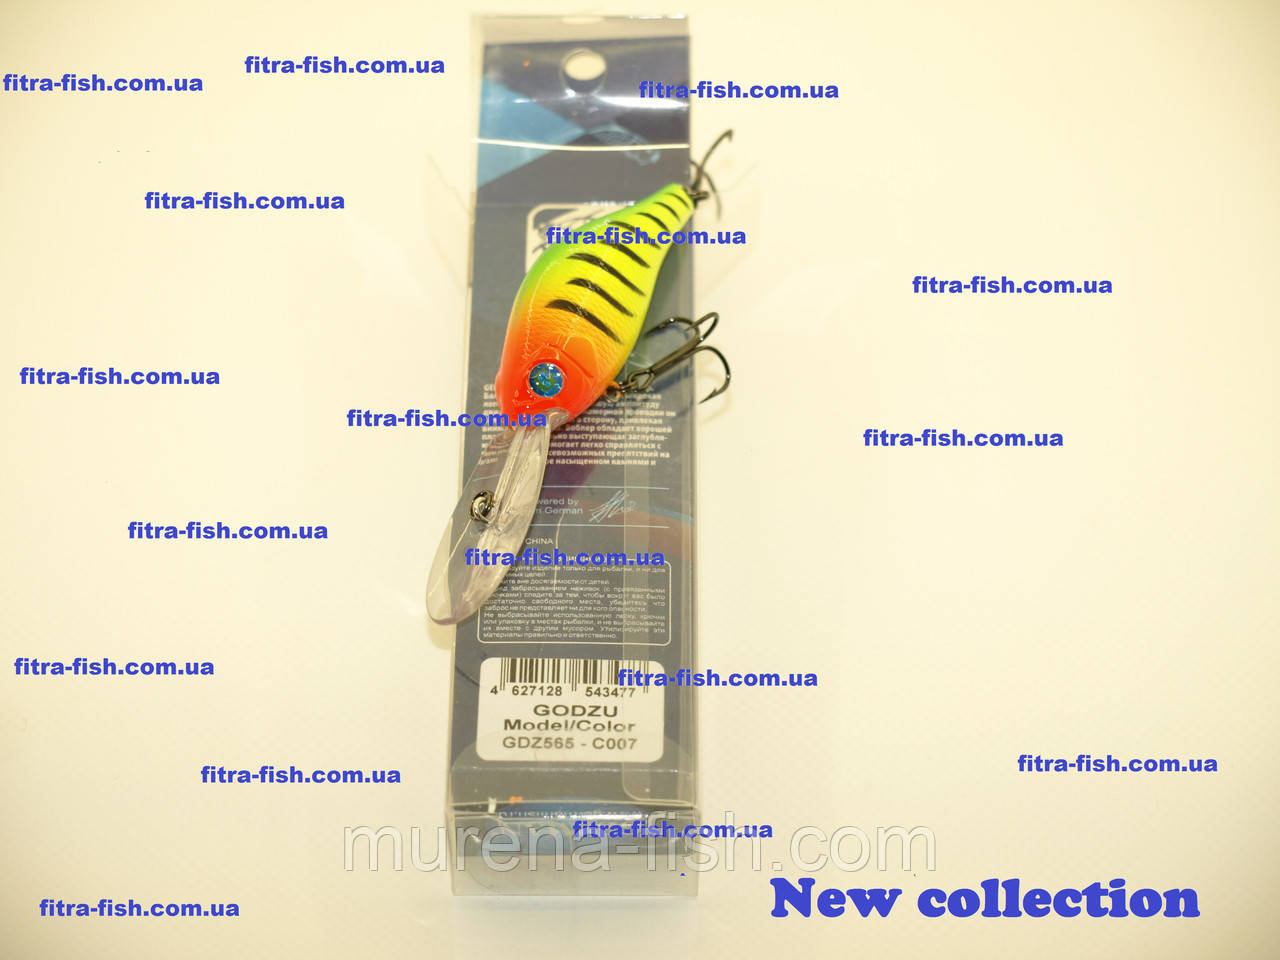 Воблер German Godzu 65mm C007 (action 3-4m+) 13,5g Аналог Zipbaits B-Switcher Rattler 4.0